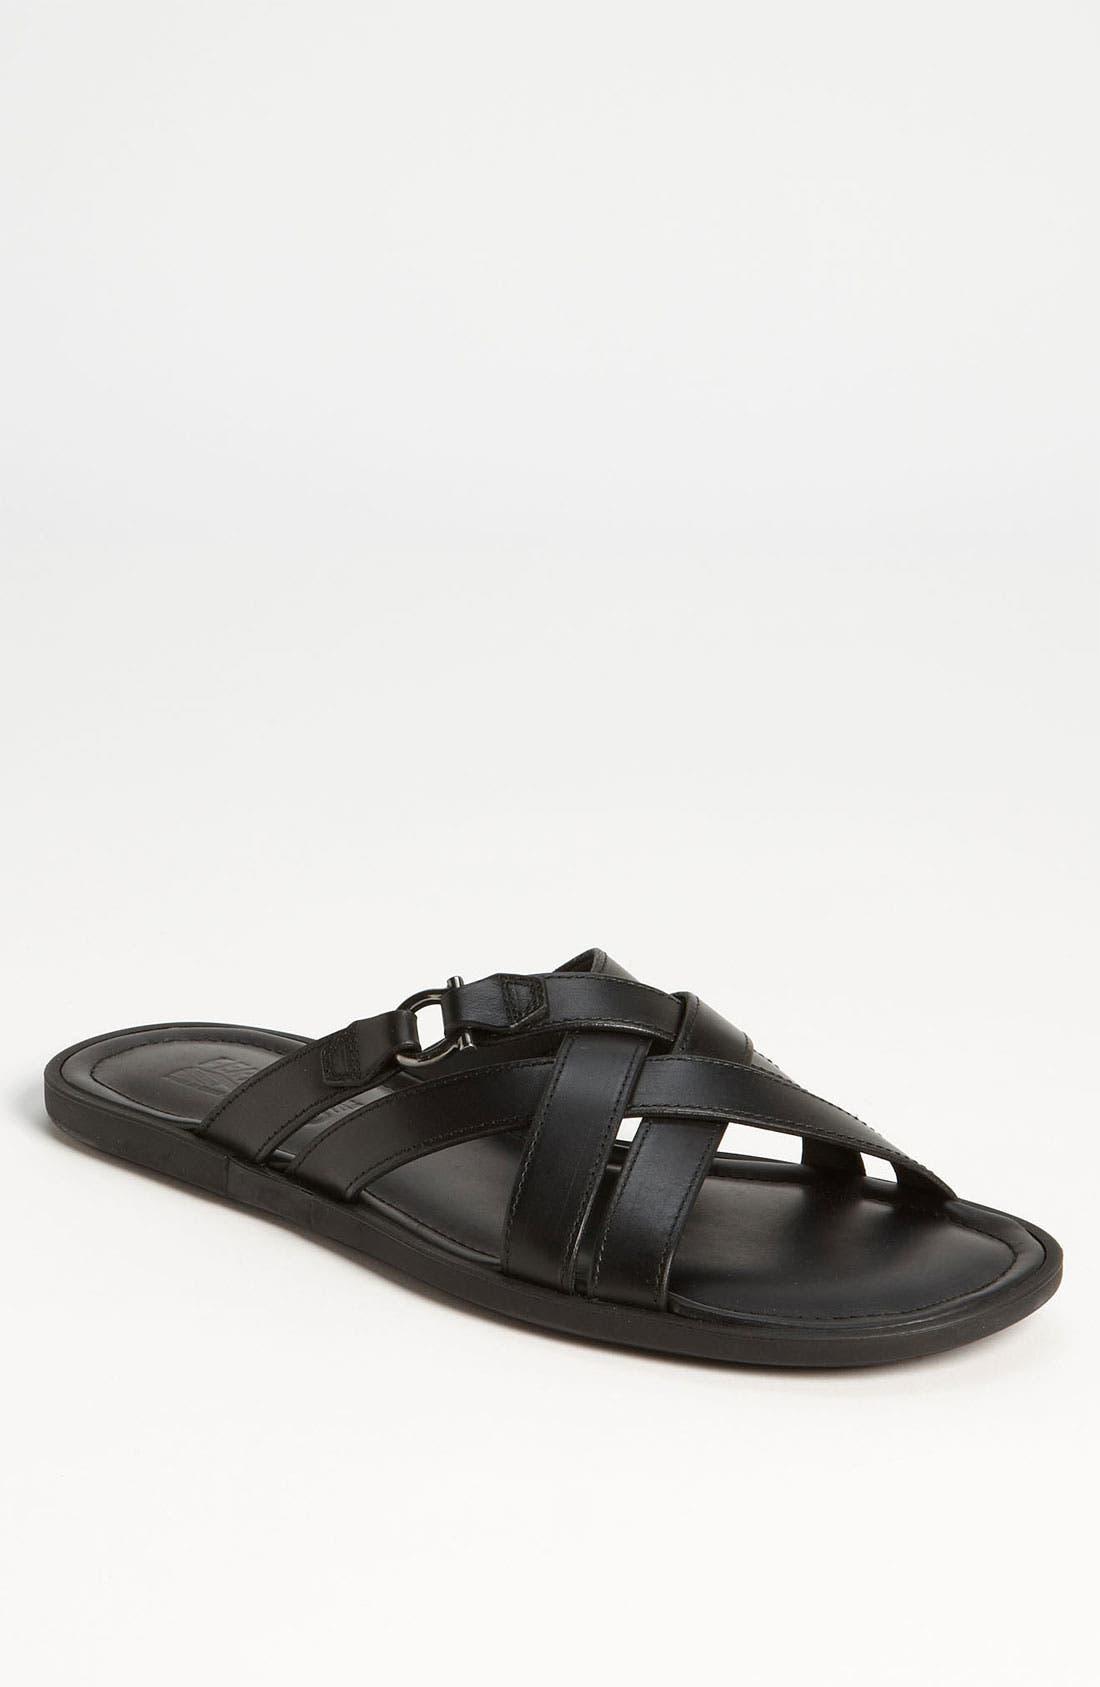 Alternate Image 1 Selected - Salvatore Ferragamo 'Tirreno' Cross Strap Sandal